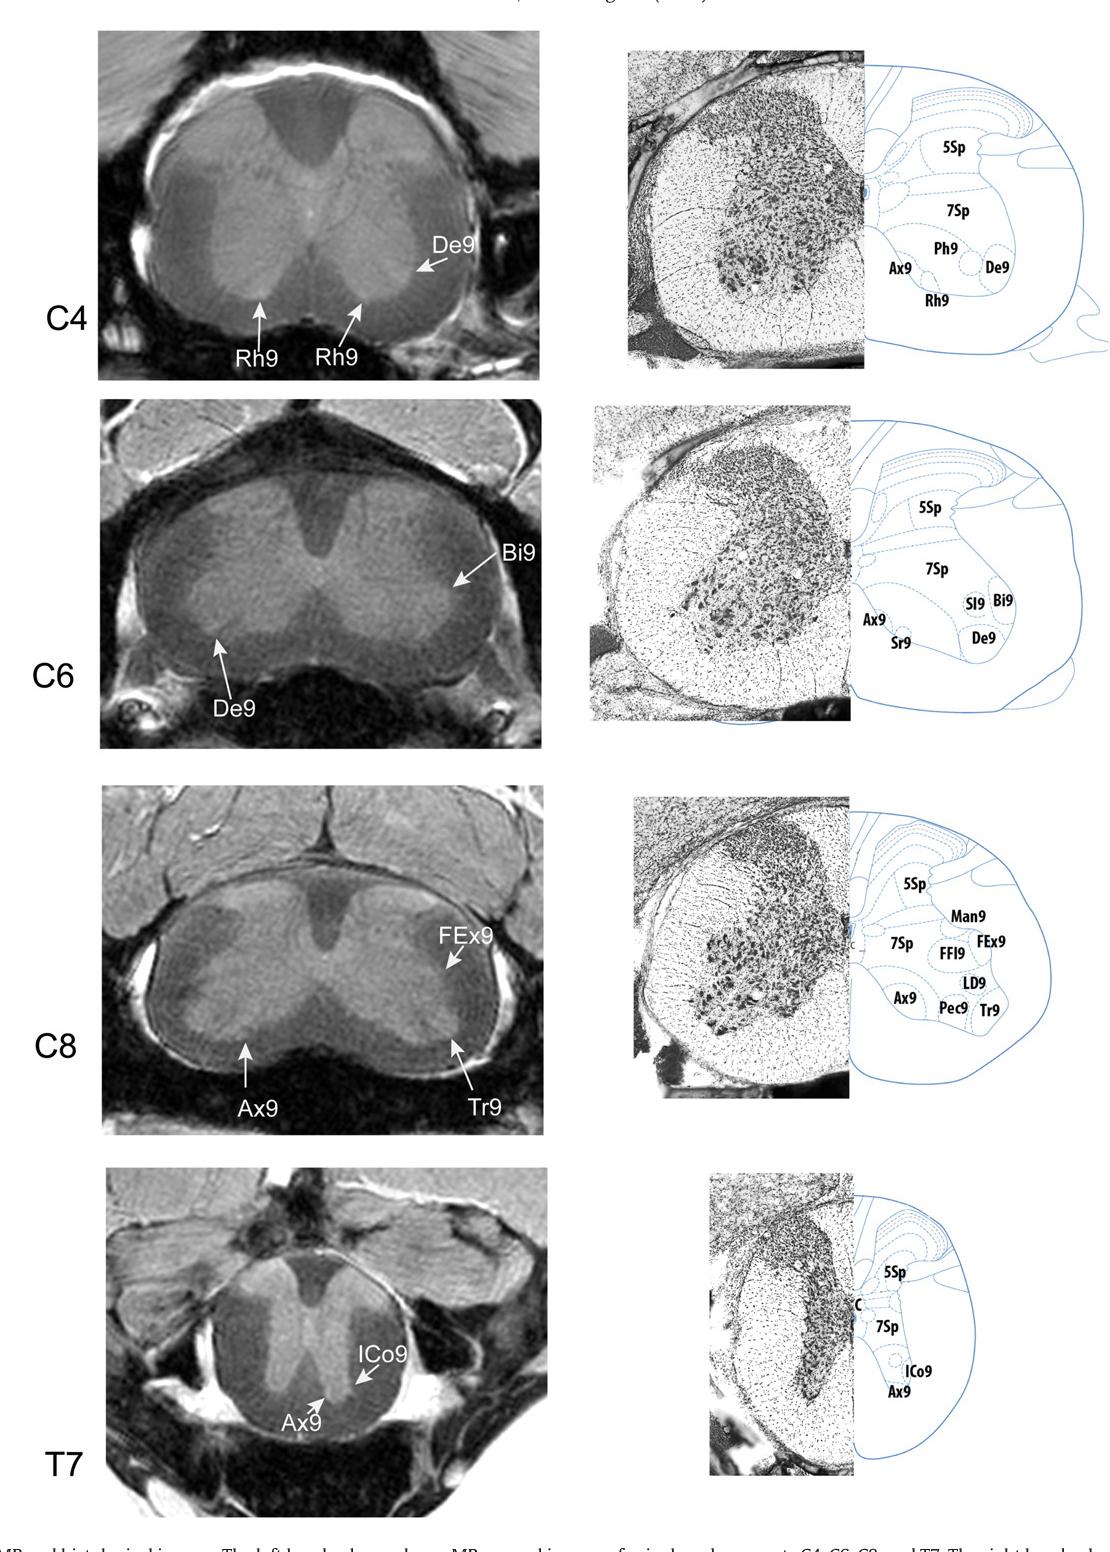 Vertebral Landmarks For The Identification Of Spinal Cord Segments